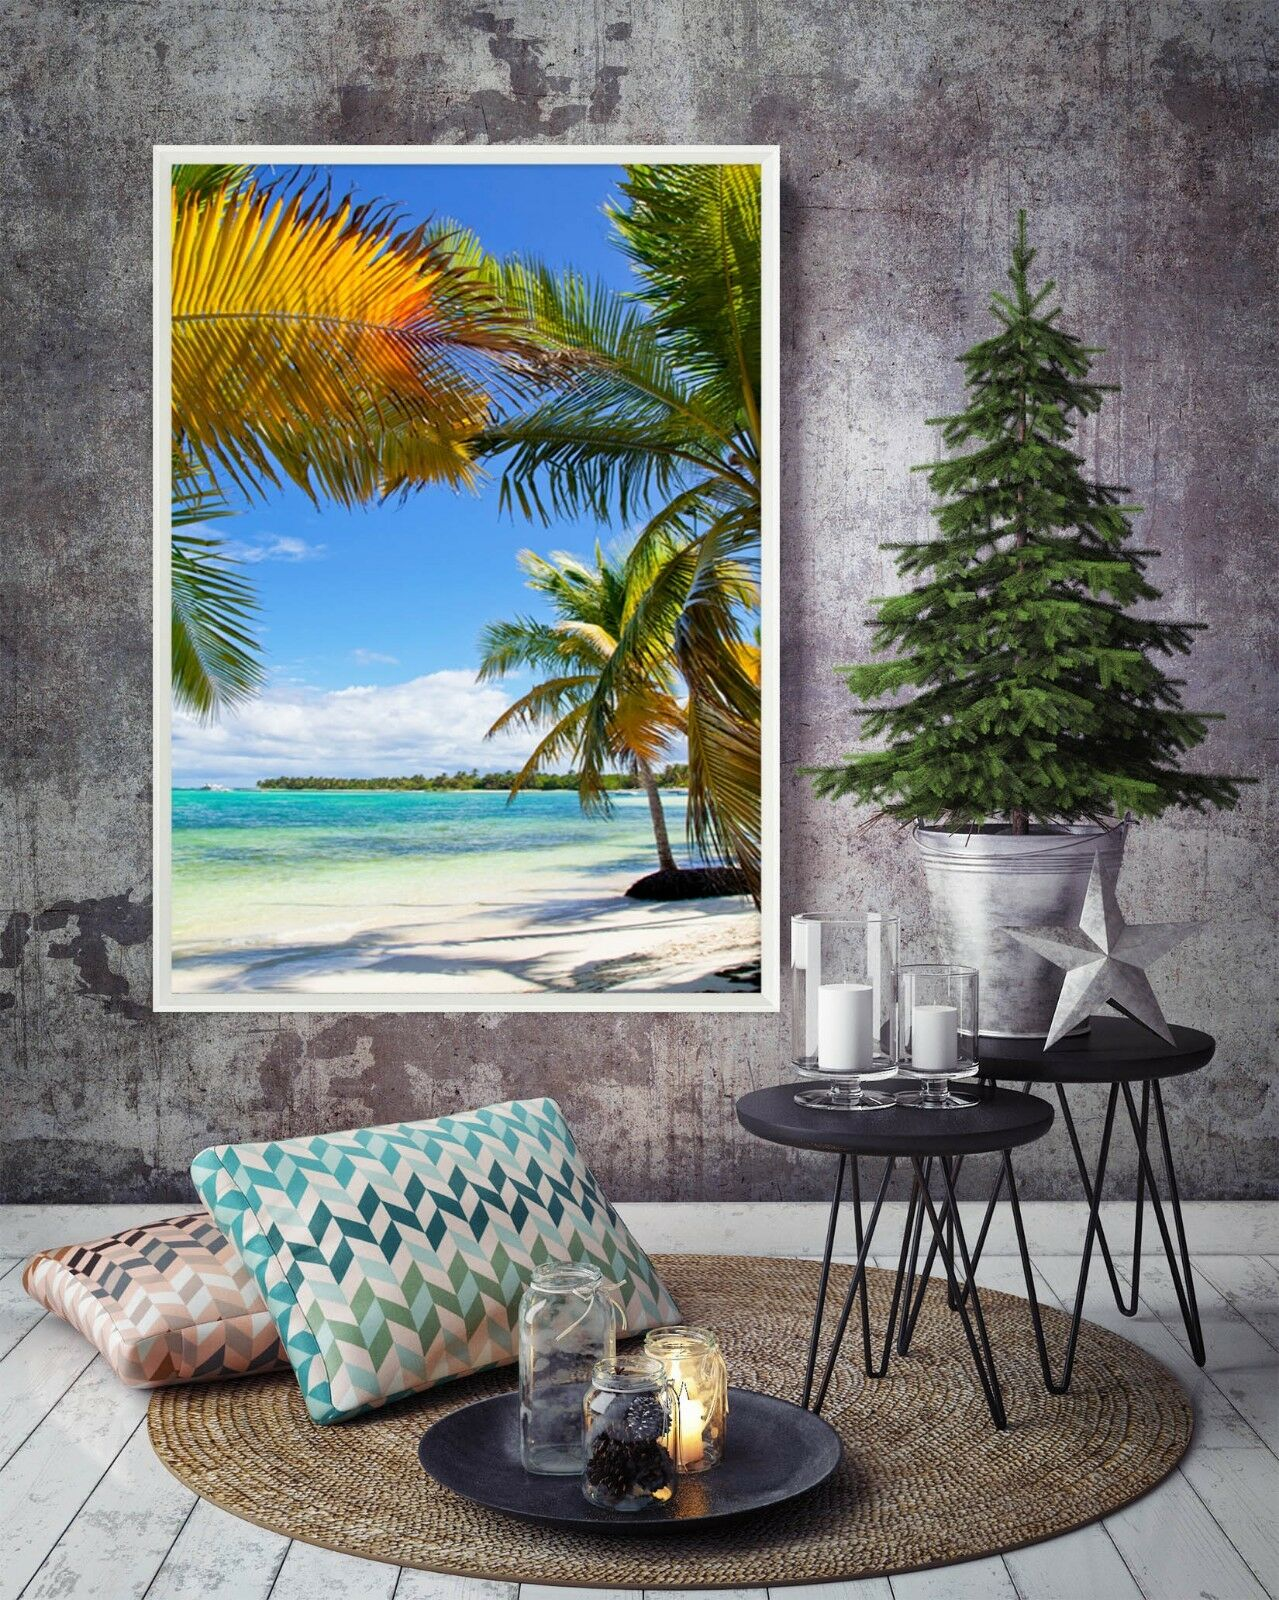 3D Coconut Tree Shadow 5 Framed Poster Home Decor Print Painting Art AJ UK